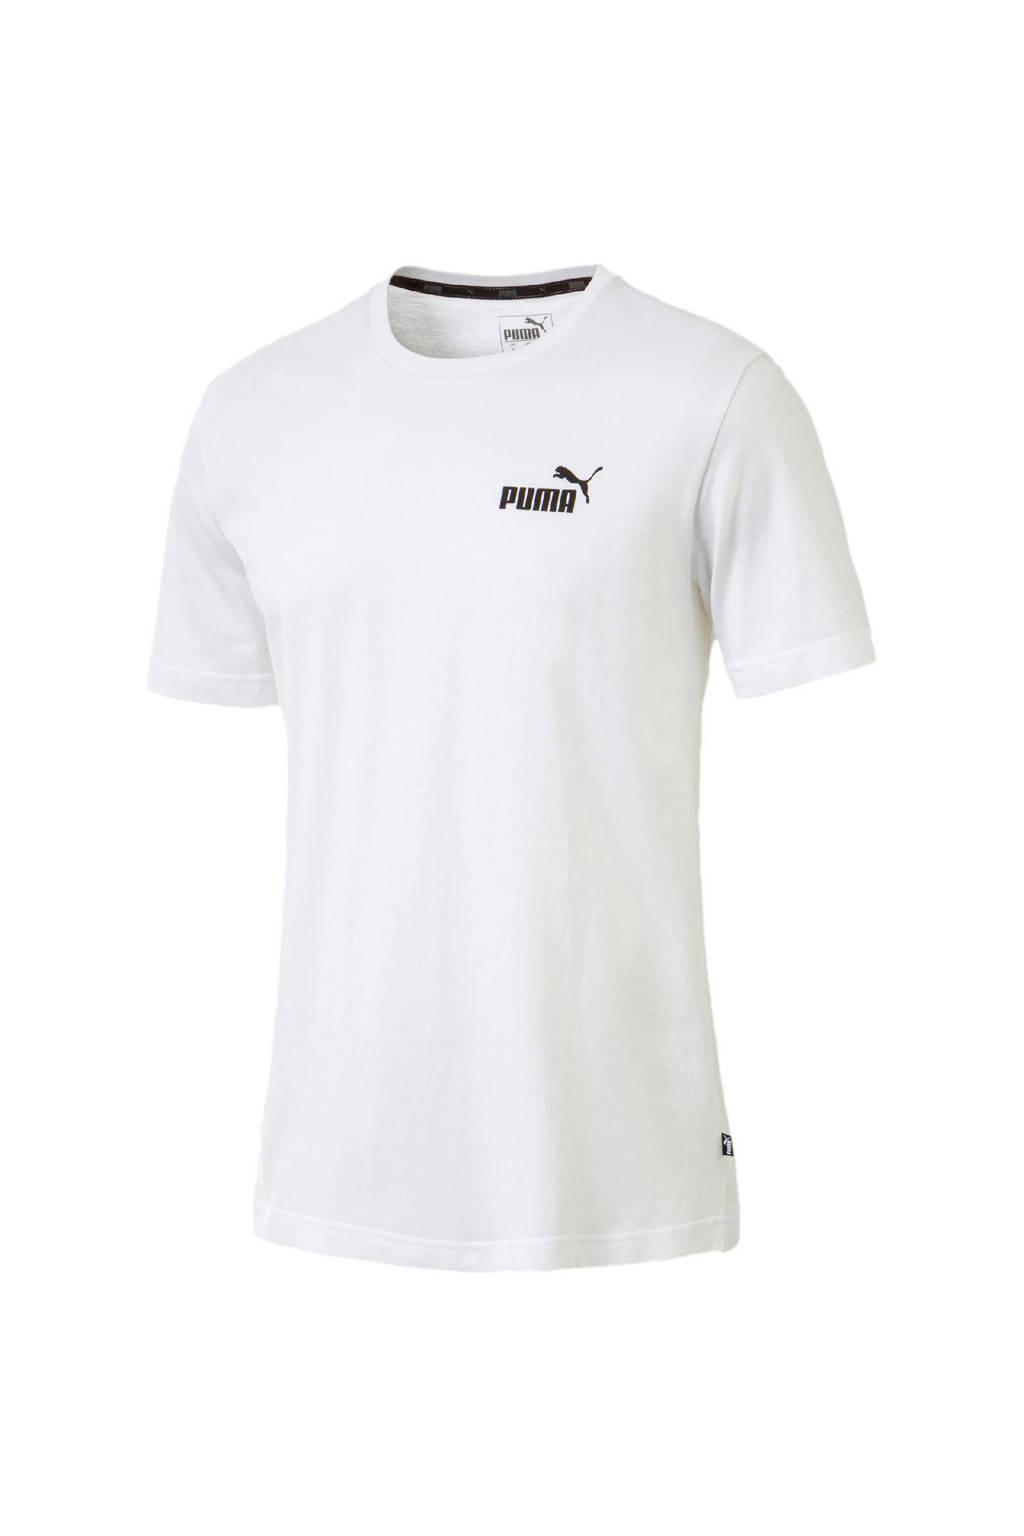 Puma   T-shirt wit, Wit/zwart